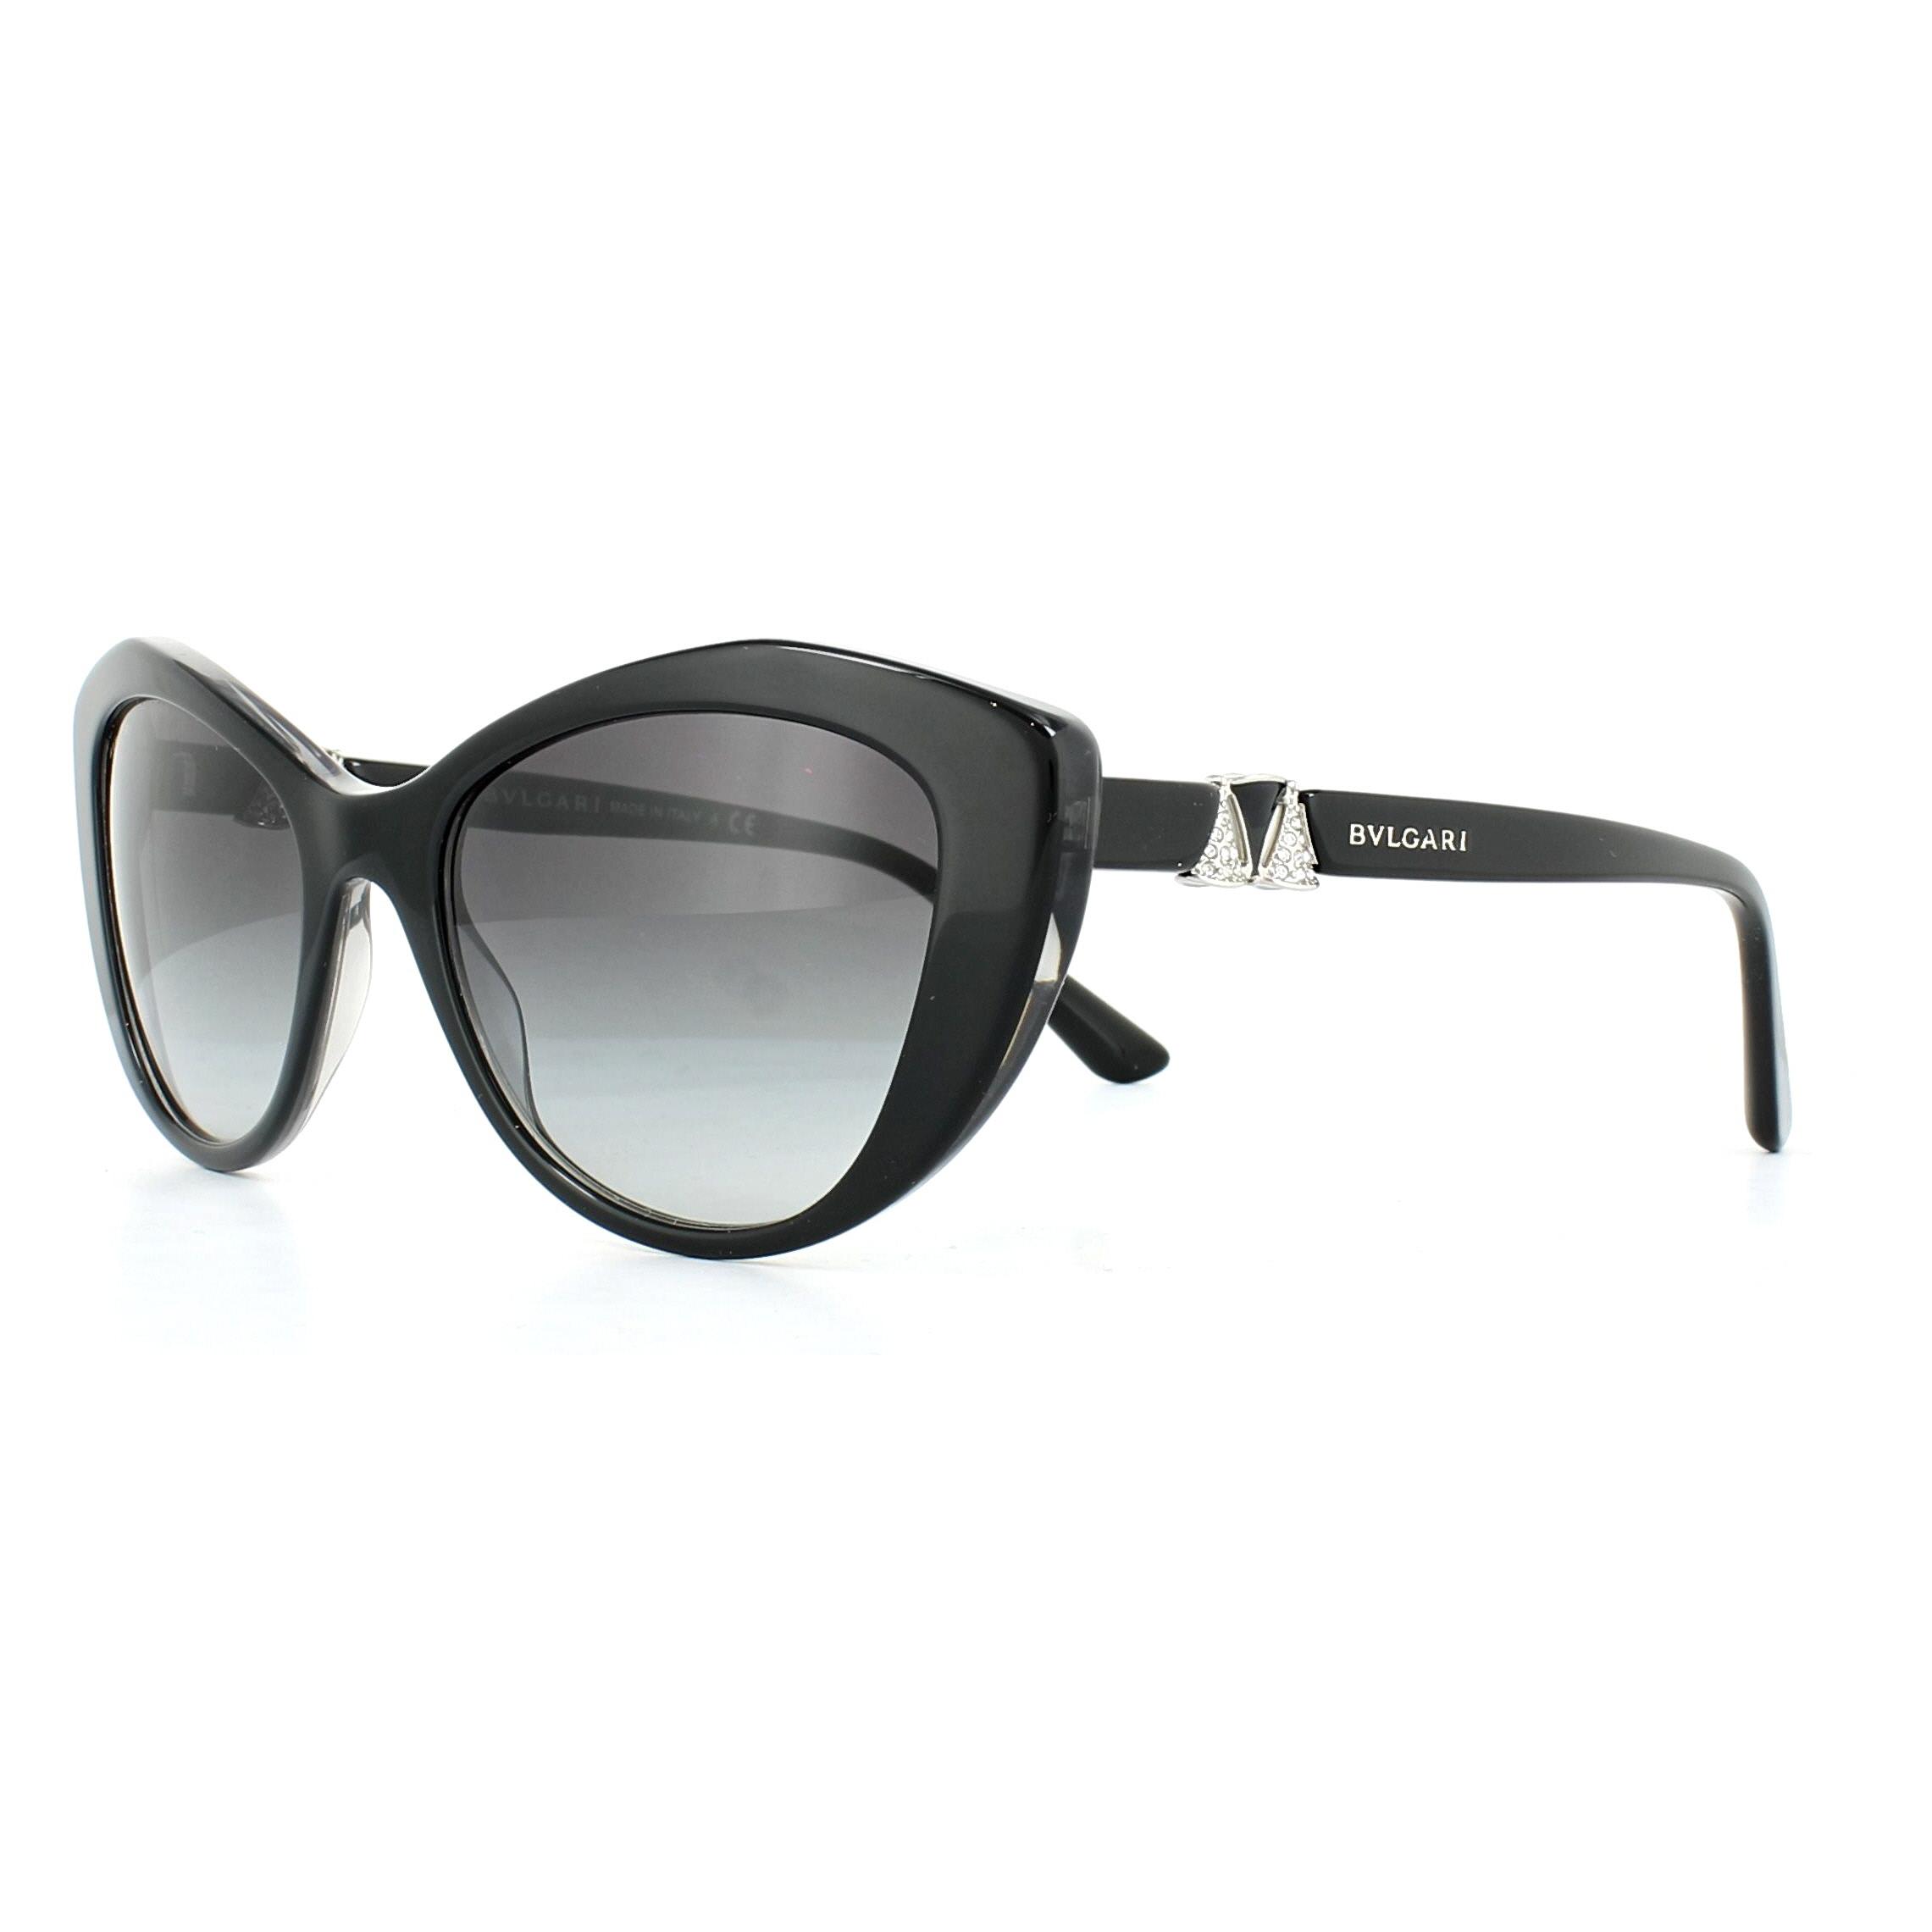 09bdb2fb778 Sentinel Bvlgari Sunglasses 8168B 53818G Top Black on Grey Crystal Grey  Gradient